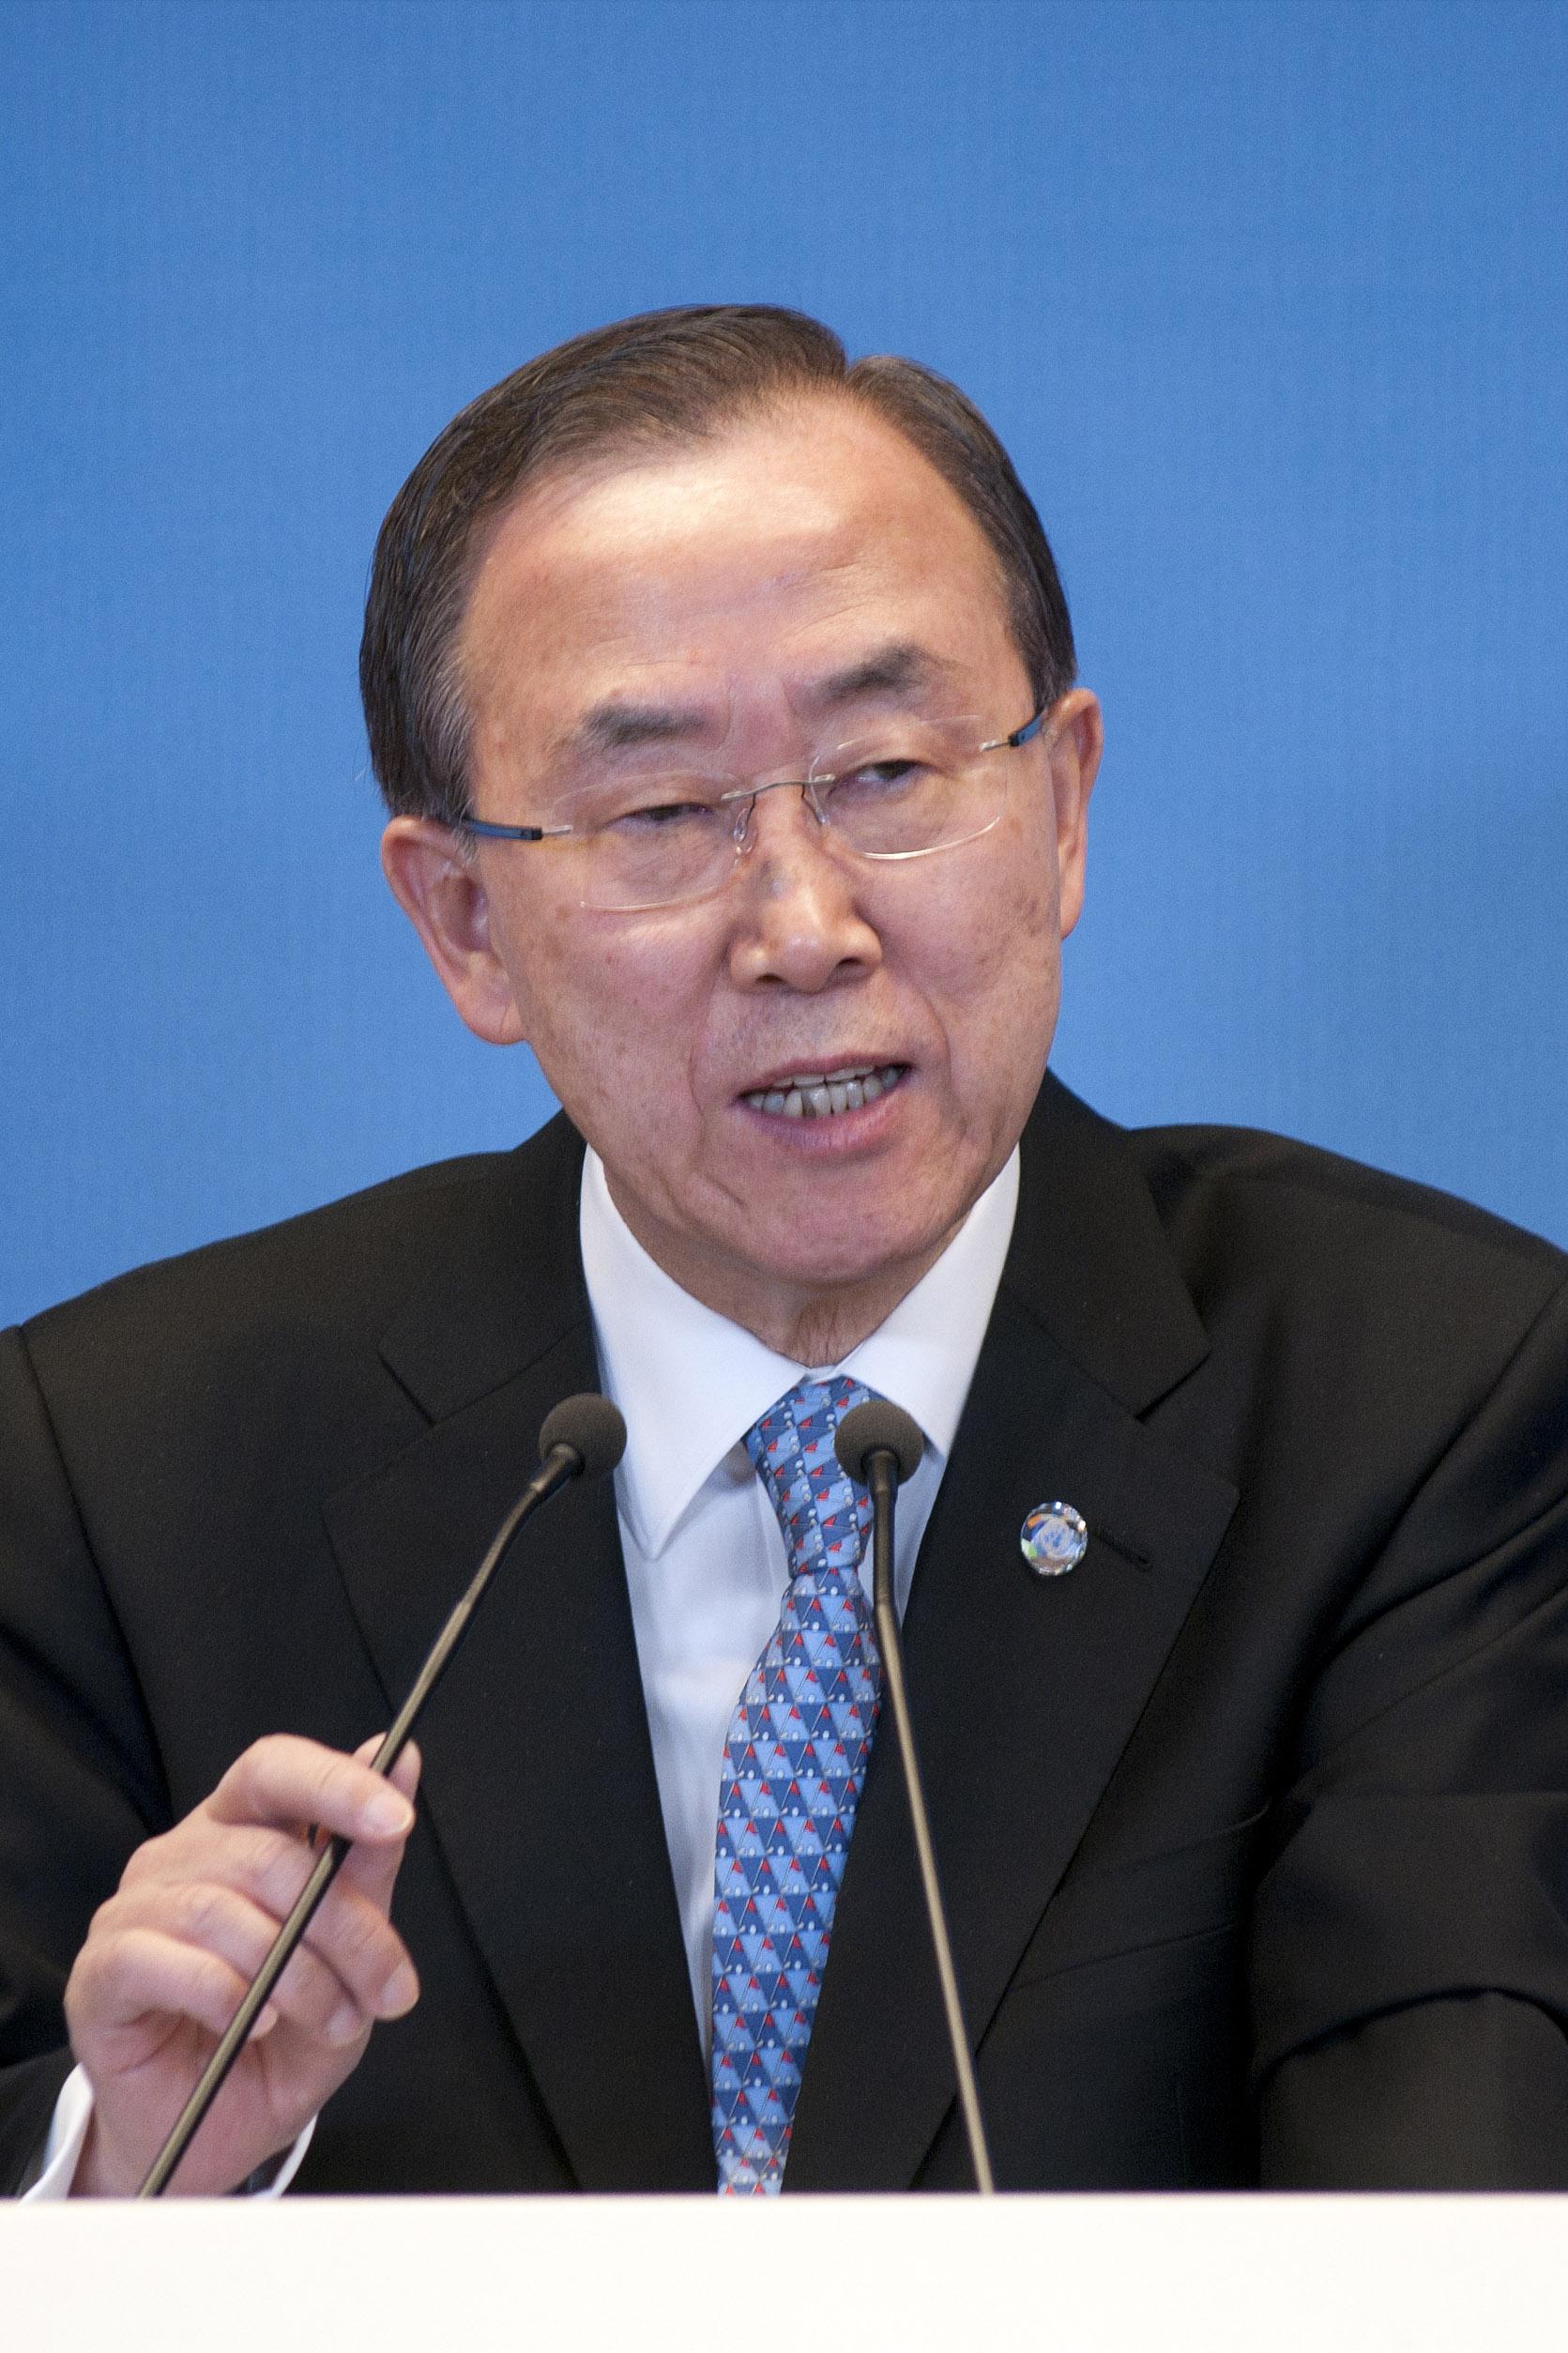 UN marks new international day